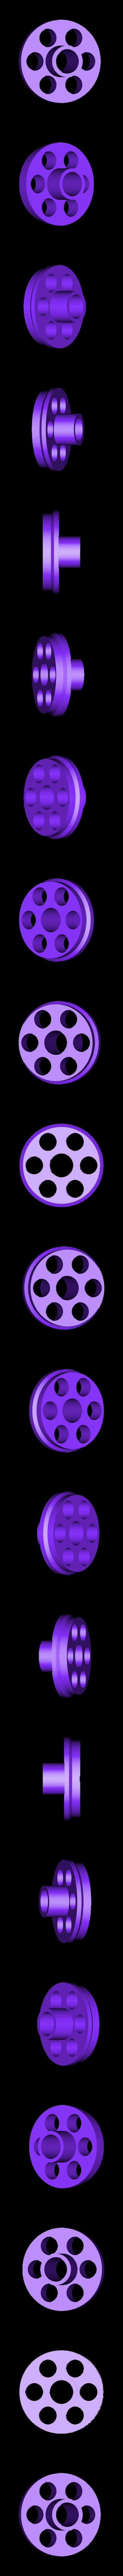 hub.stl Télécharger fichier STL gratuit Anycubic filament spool holder tuning set • Plan imprimable en 3D, bda